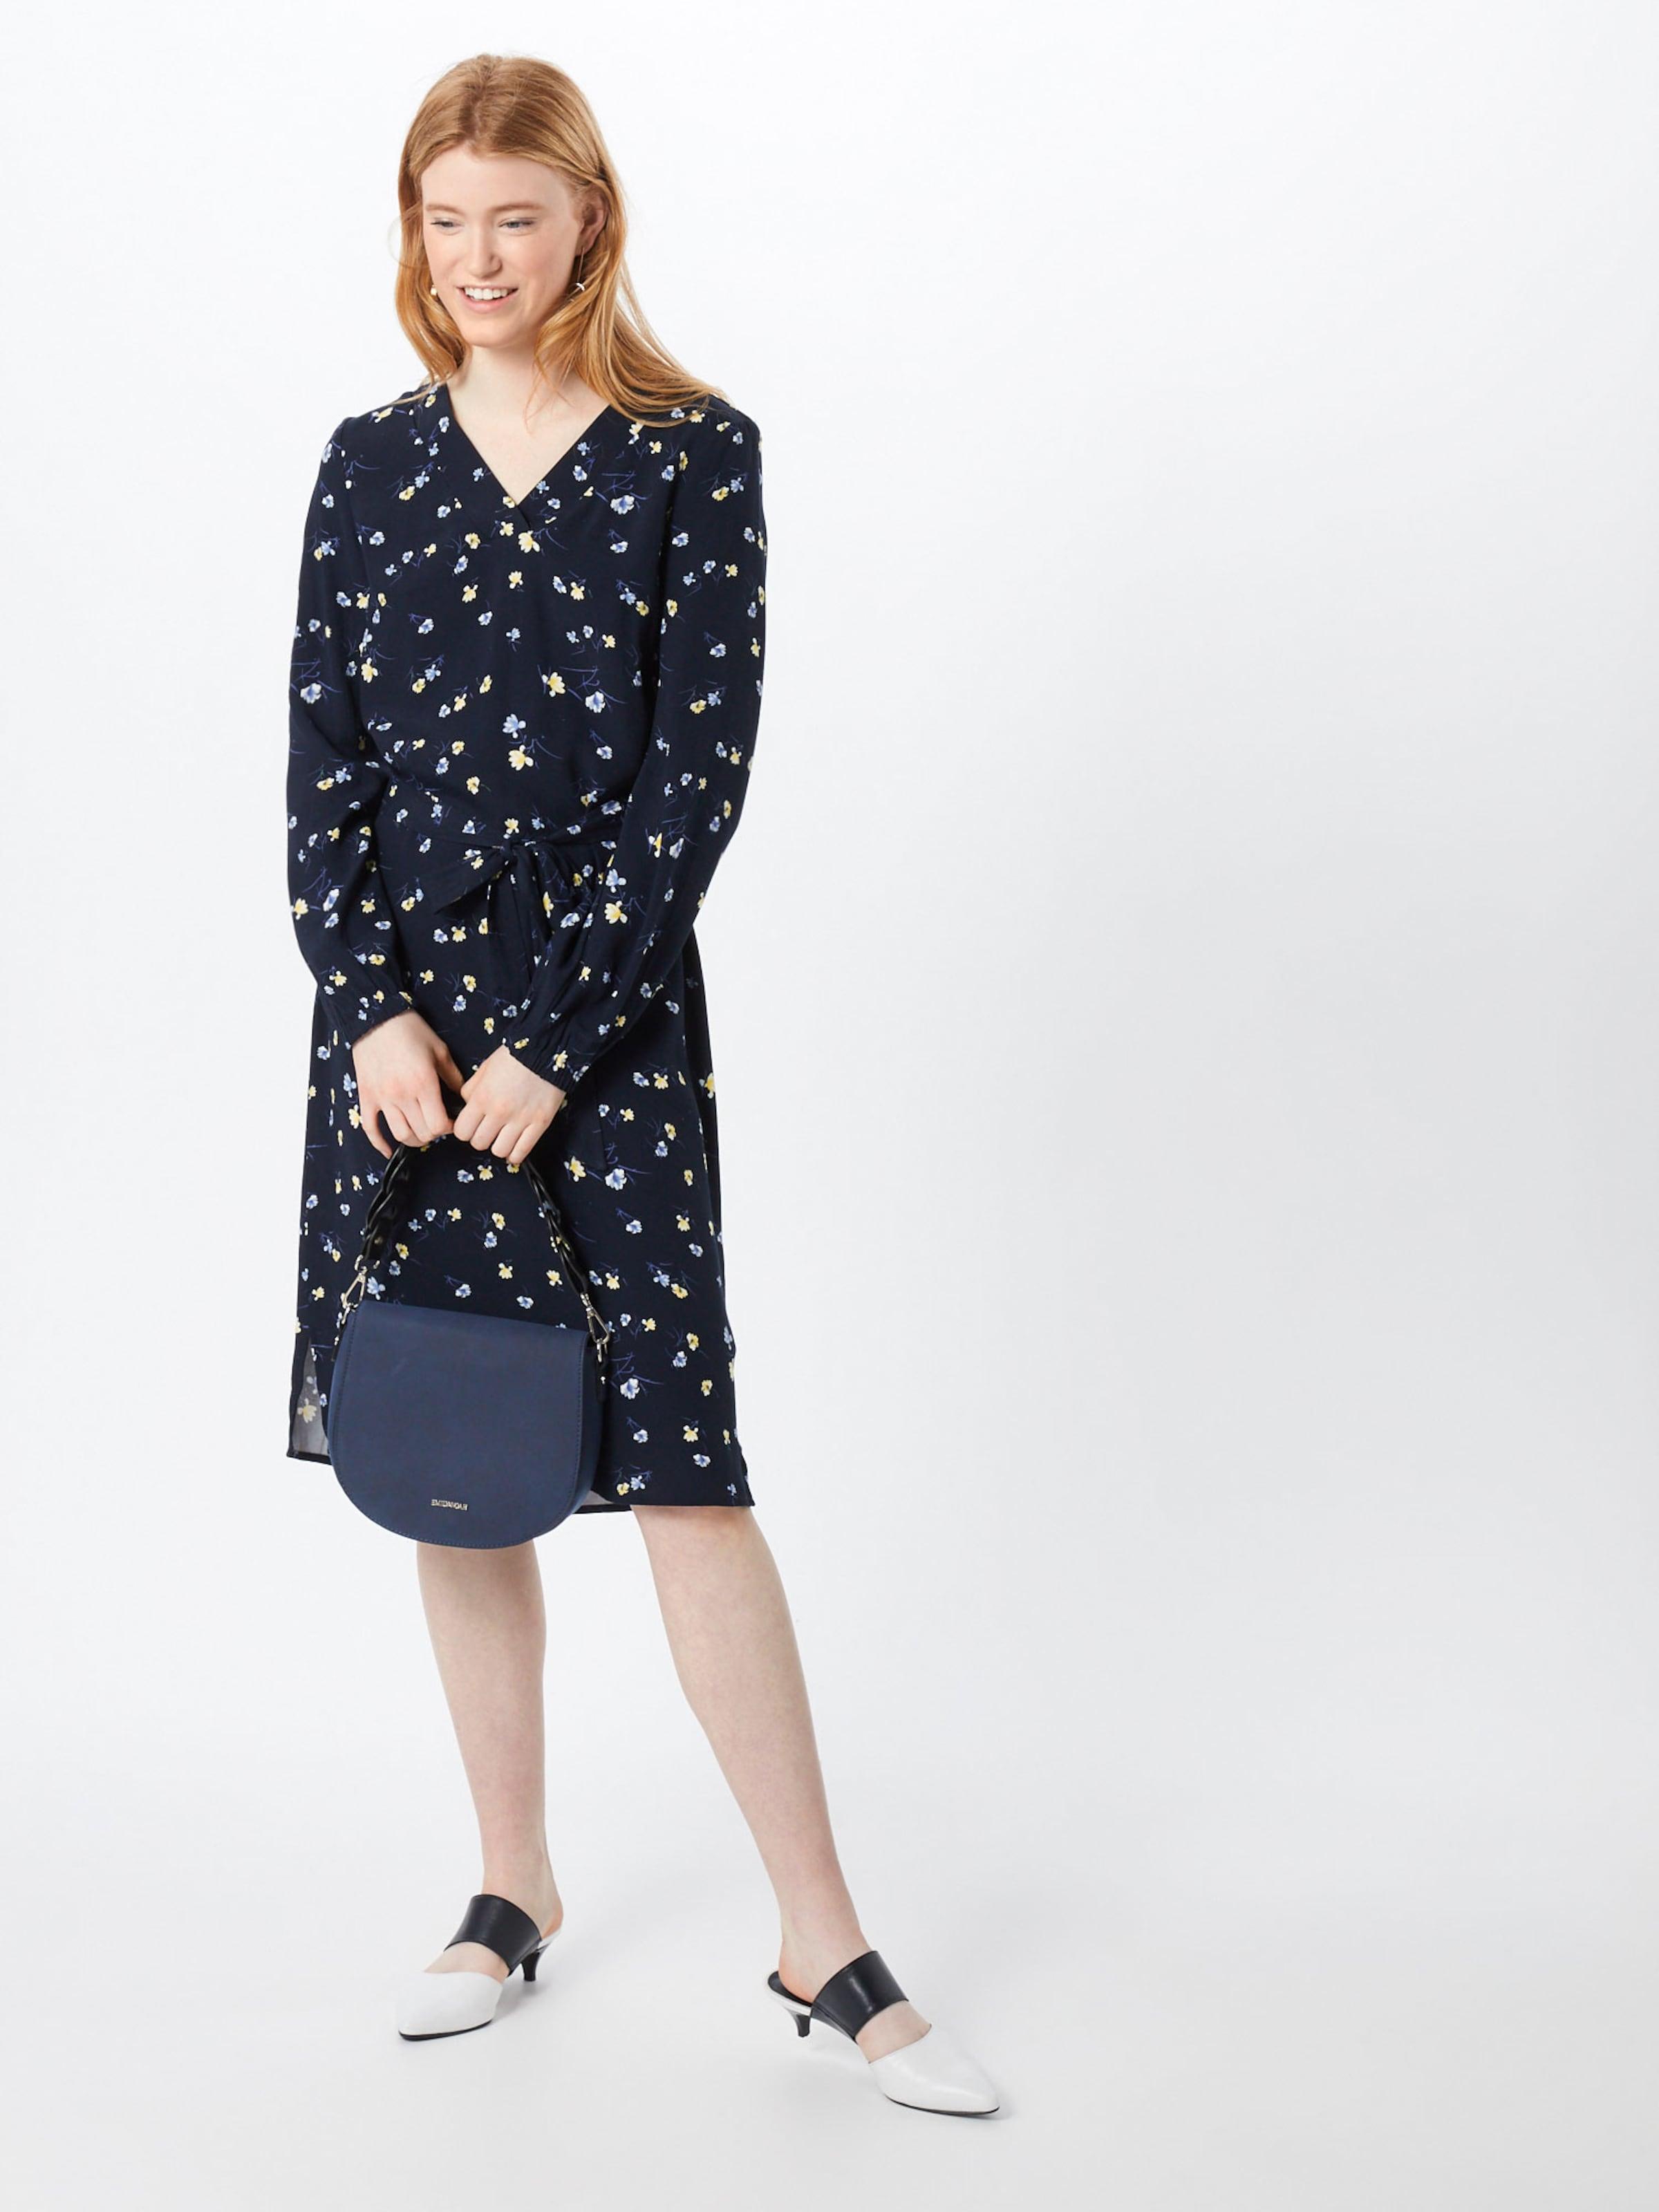 Casual Dress' MarineMélange Tailor Couleurs Flower En De Bleu 'my Tom Robe FcJlTK1